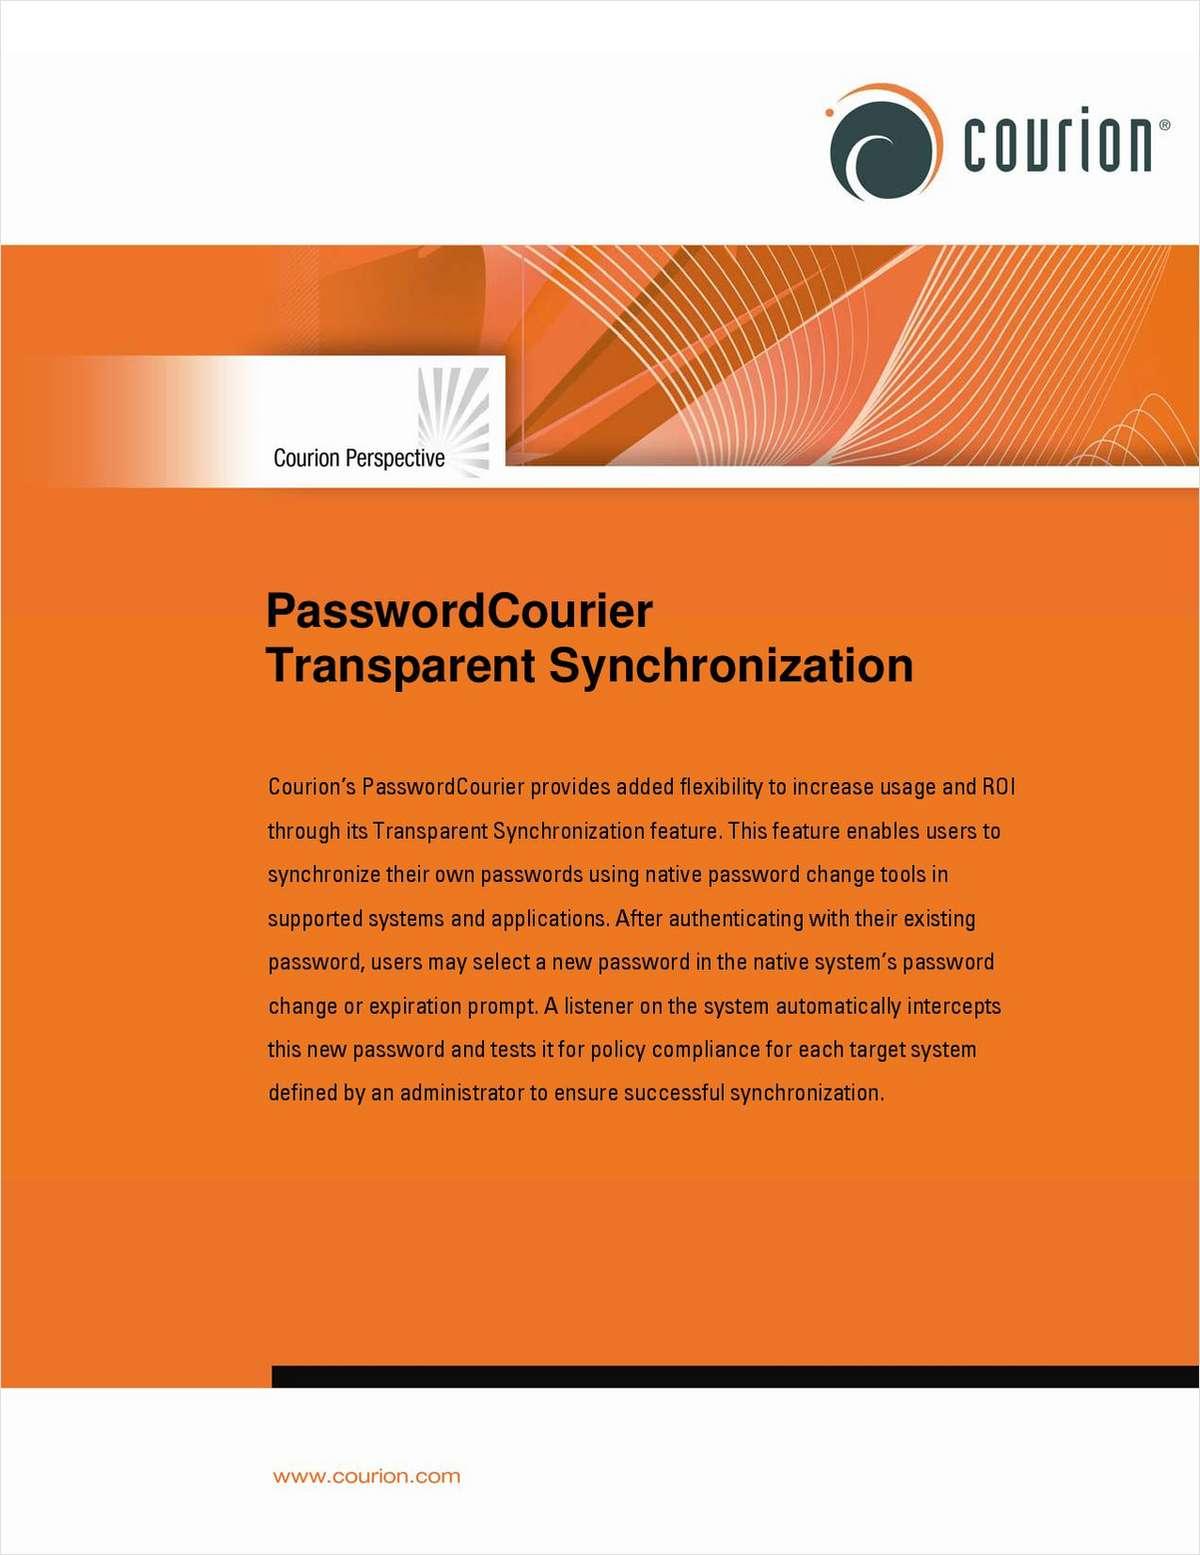 PasswordCourier Transparent Synchronization